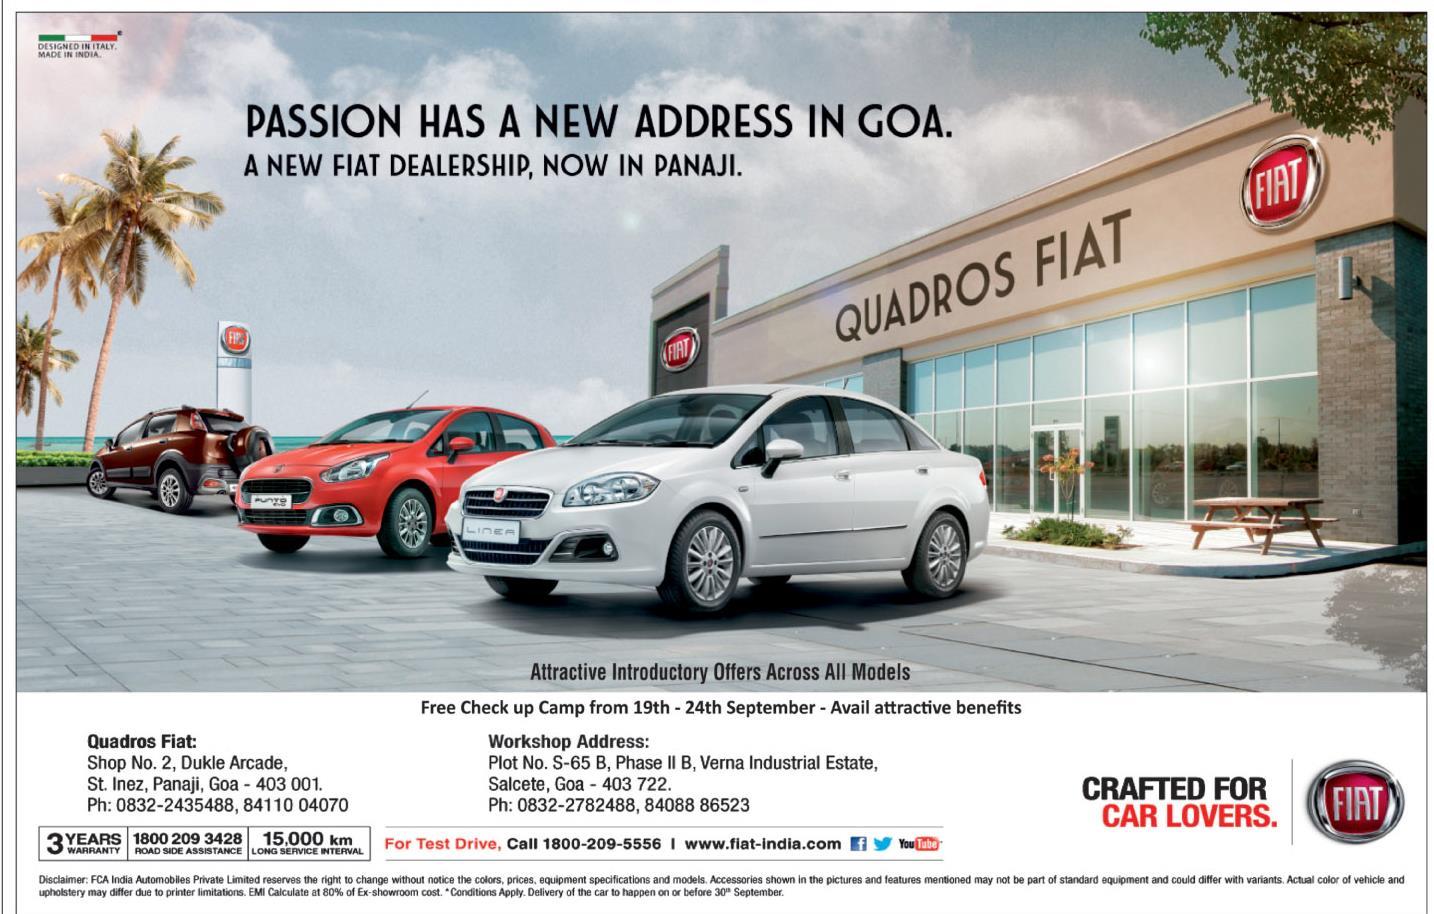 chairman rajeev fiat india president rio mr pvt limited premier doshi maitreya md ltd agreement automobiles multijet ceo kapoor